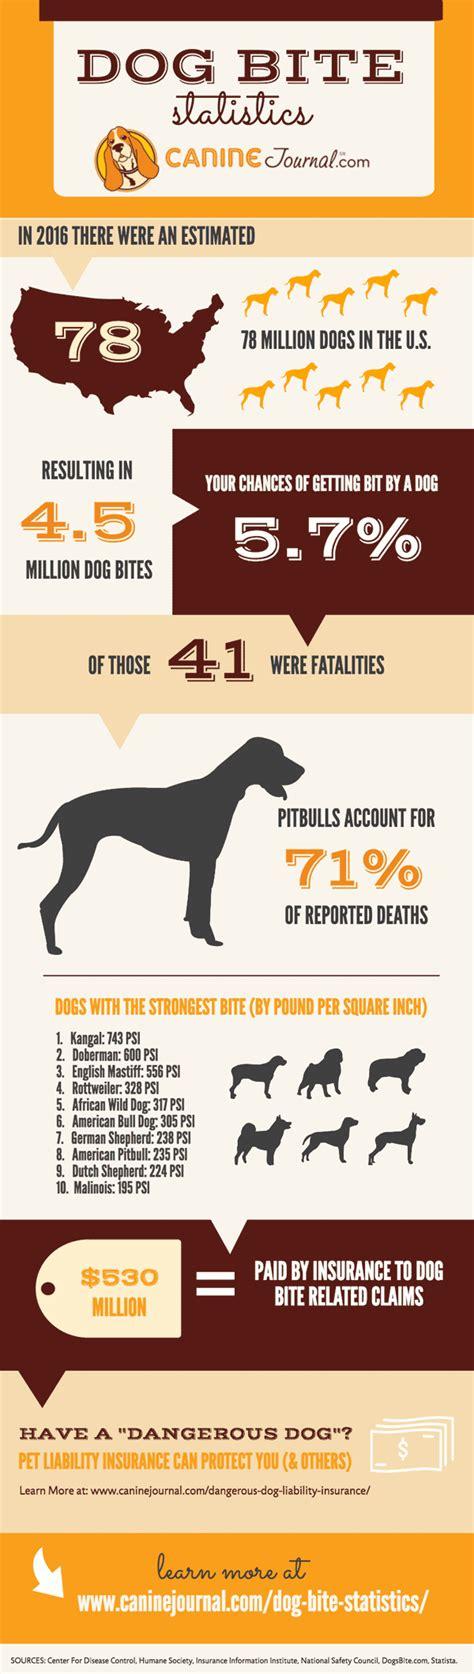 attack statistics bite statistics caninejournal